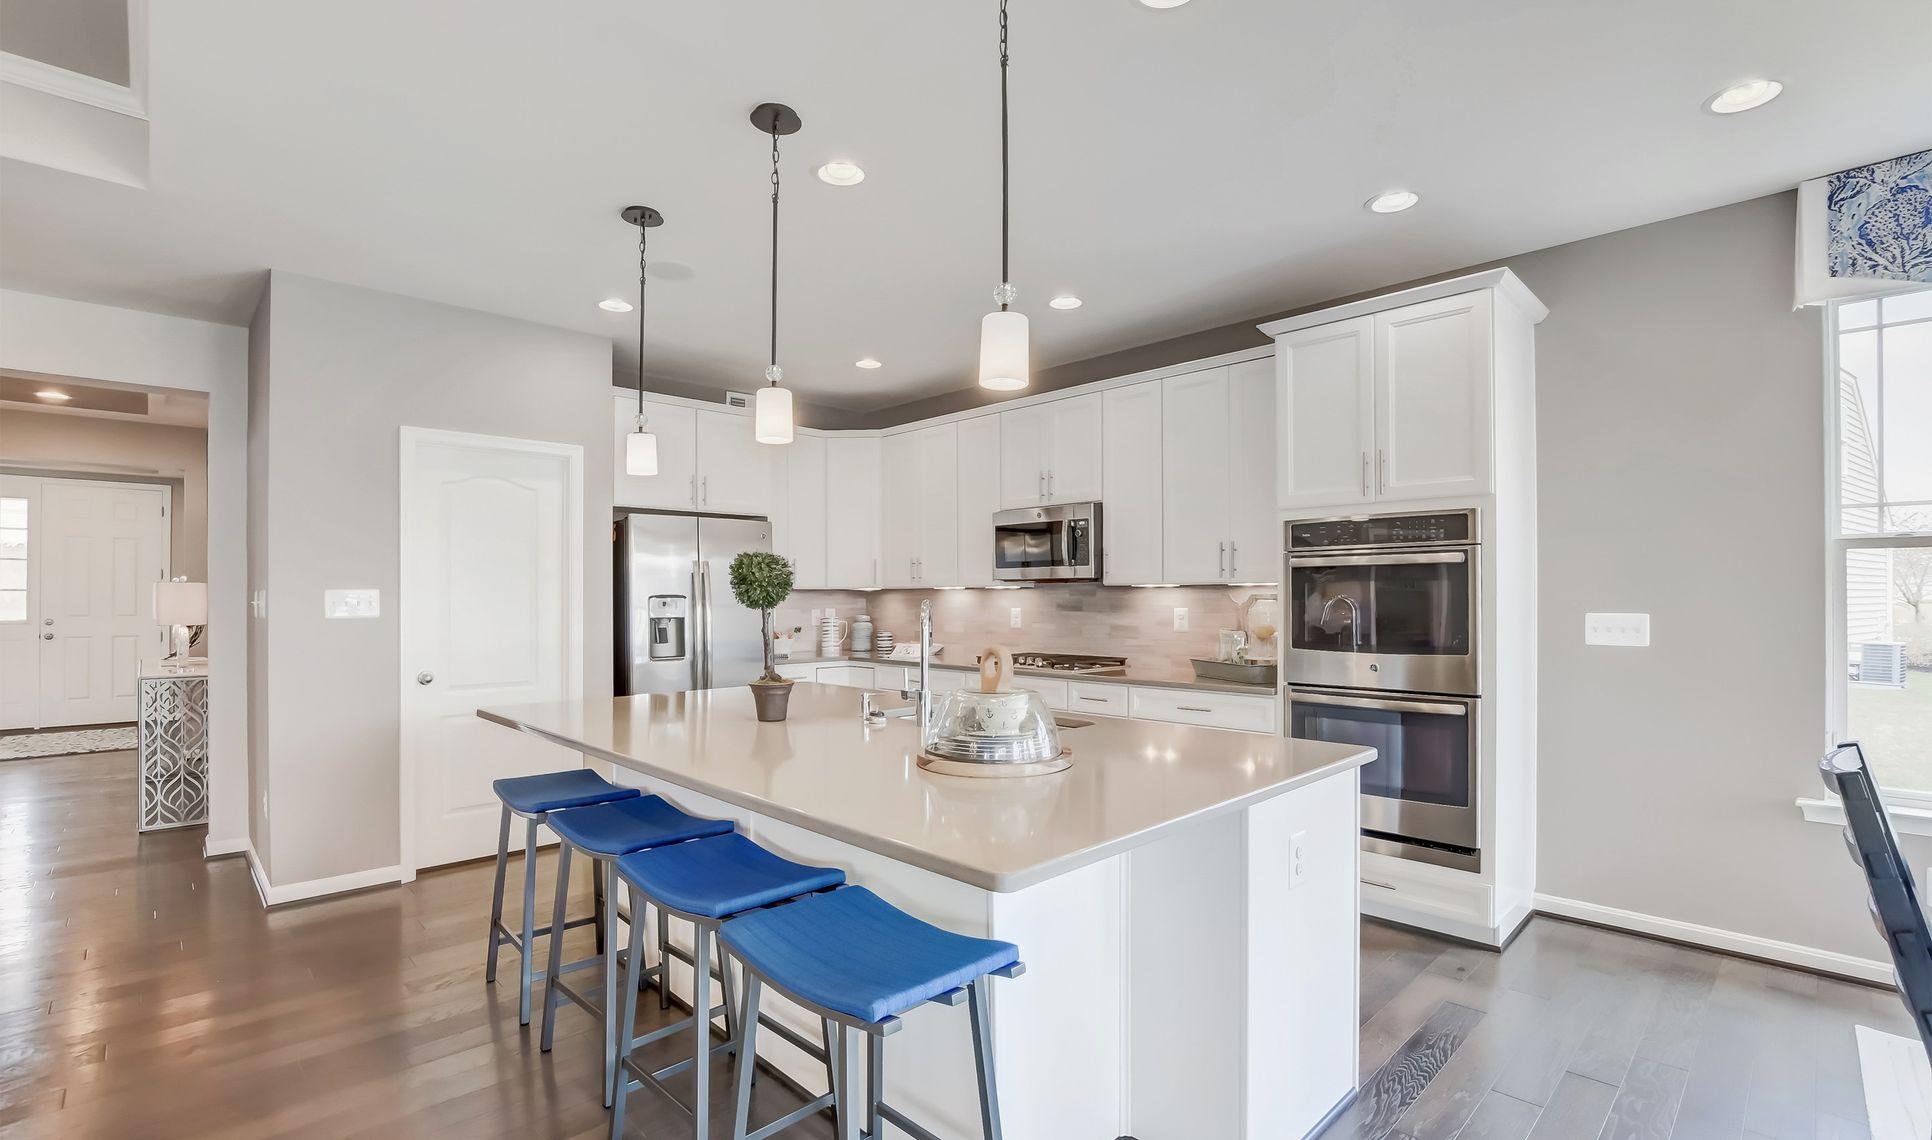 Interior:Kitchen with spacious island